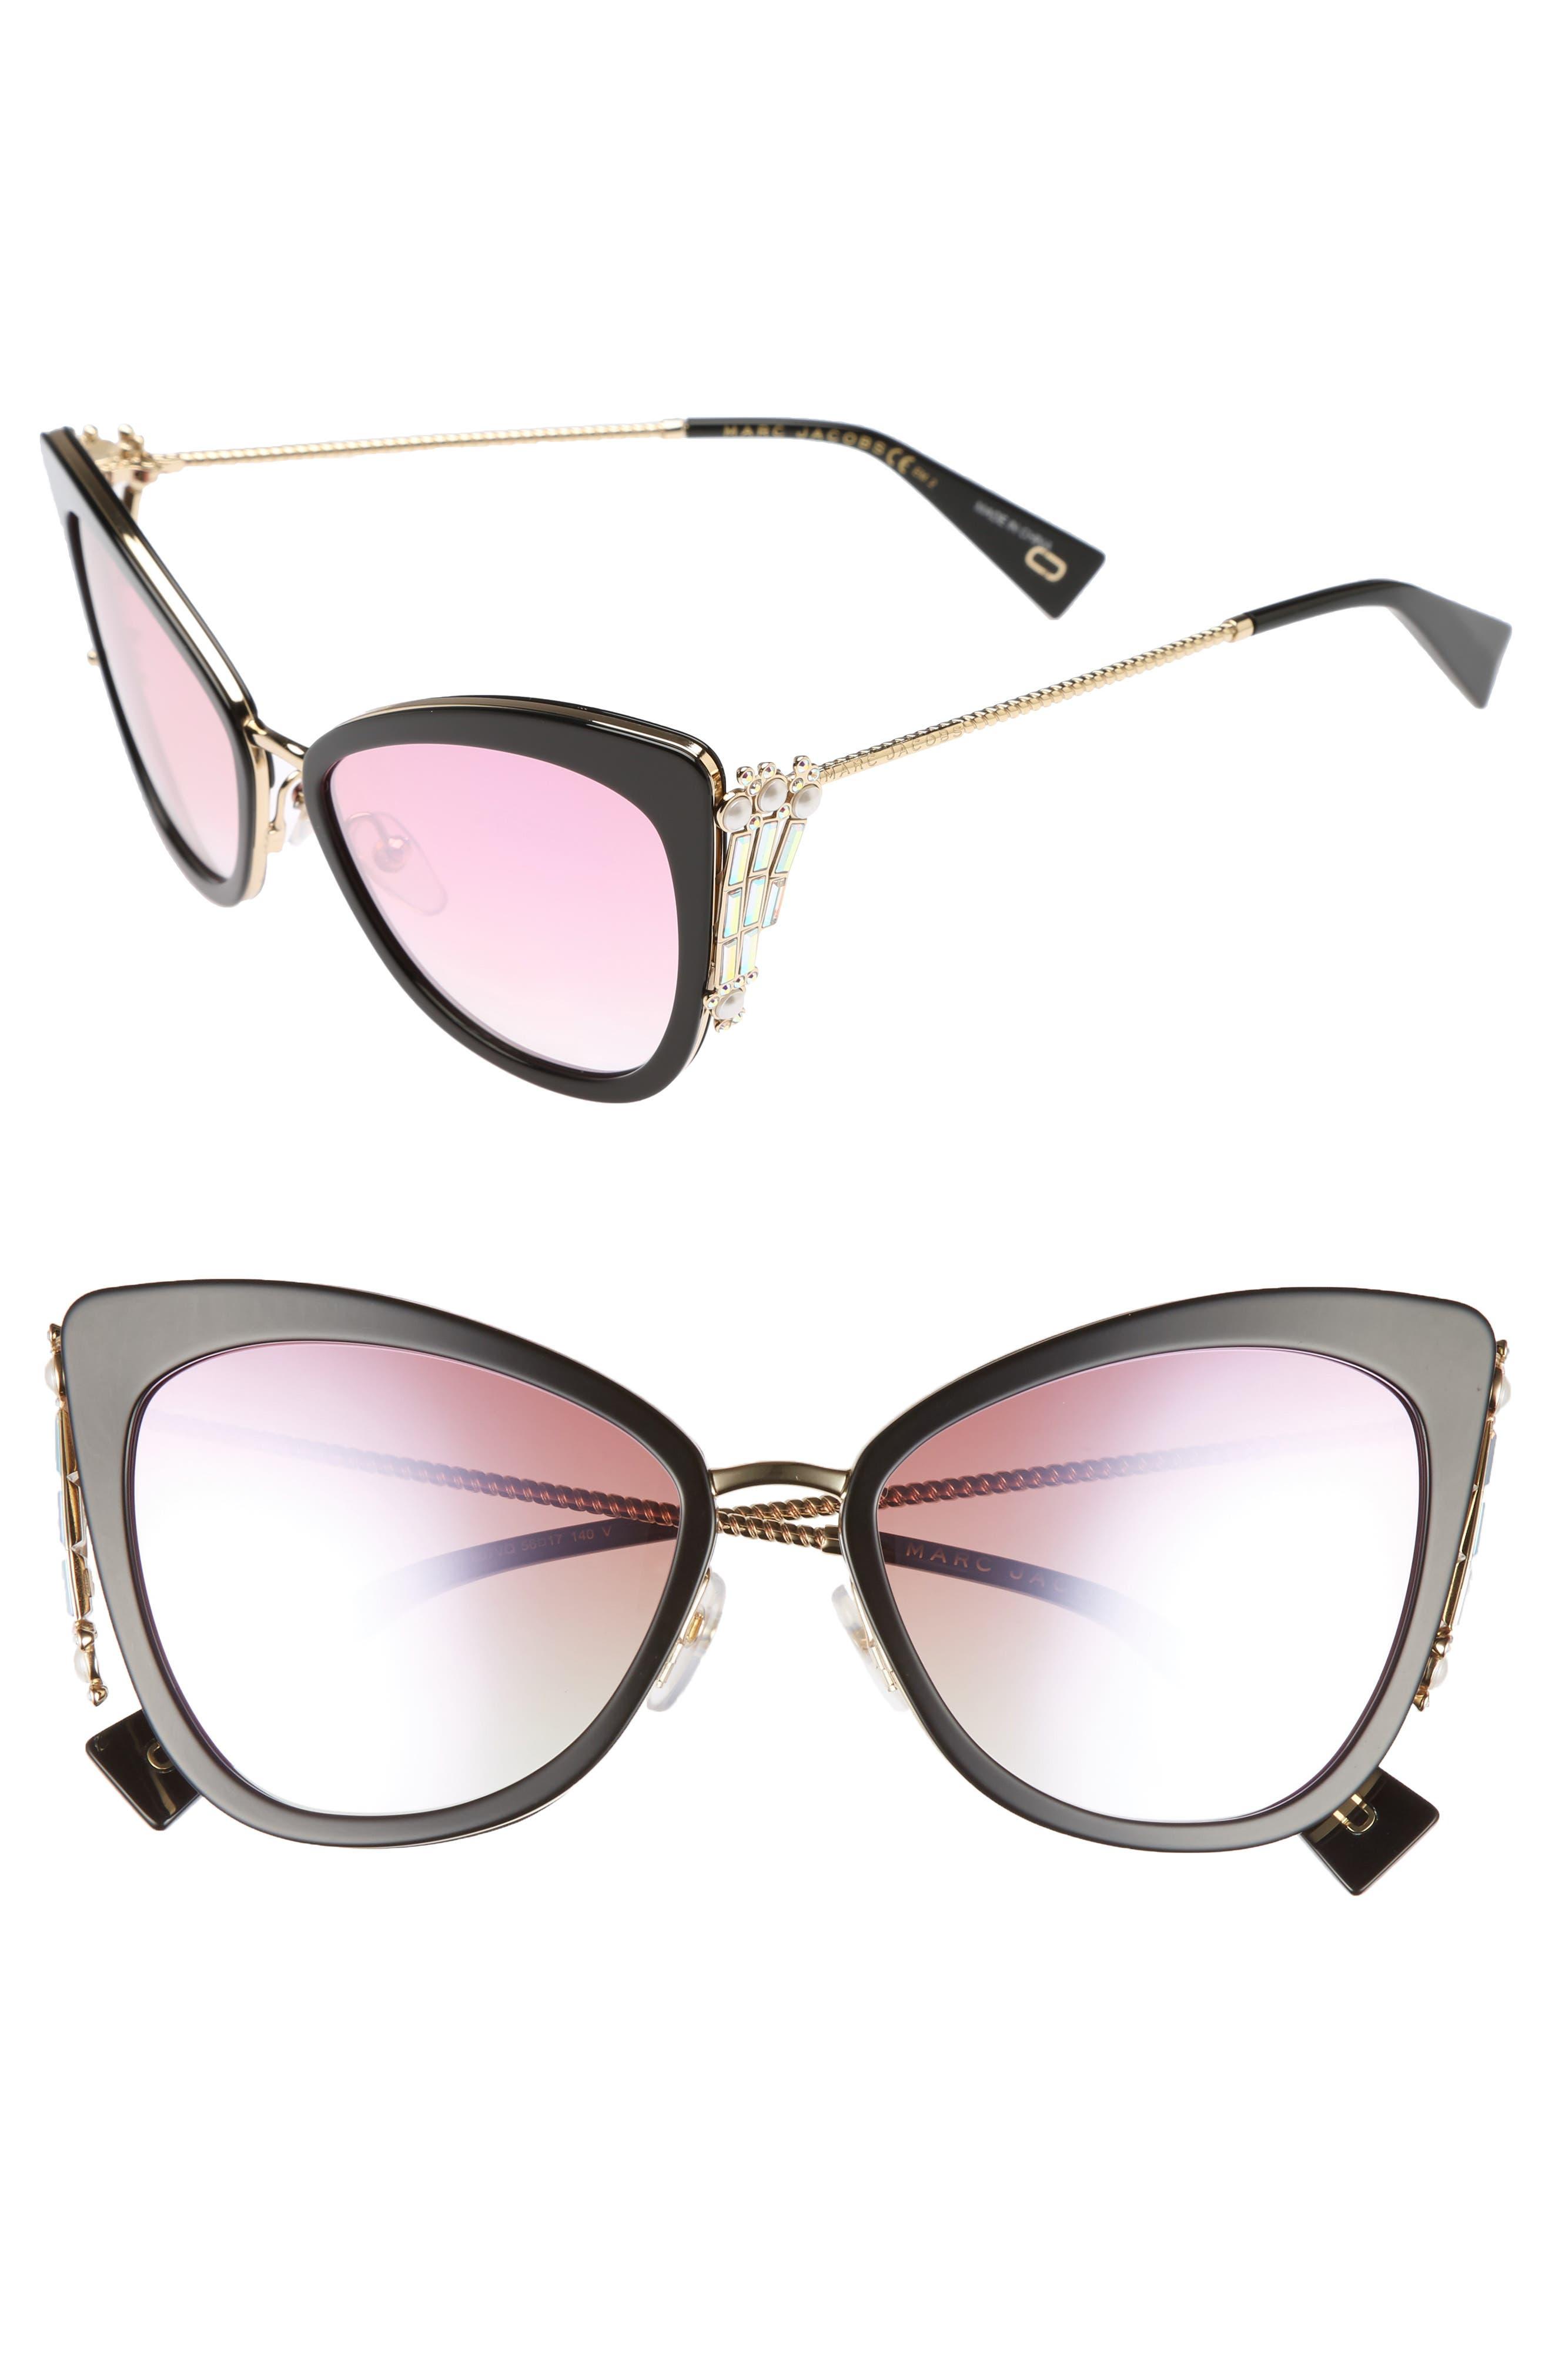 Alternate Image 1 Selected - MARC JACOBS Embellished 56mm Cat Eye Sunglasses